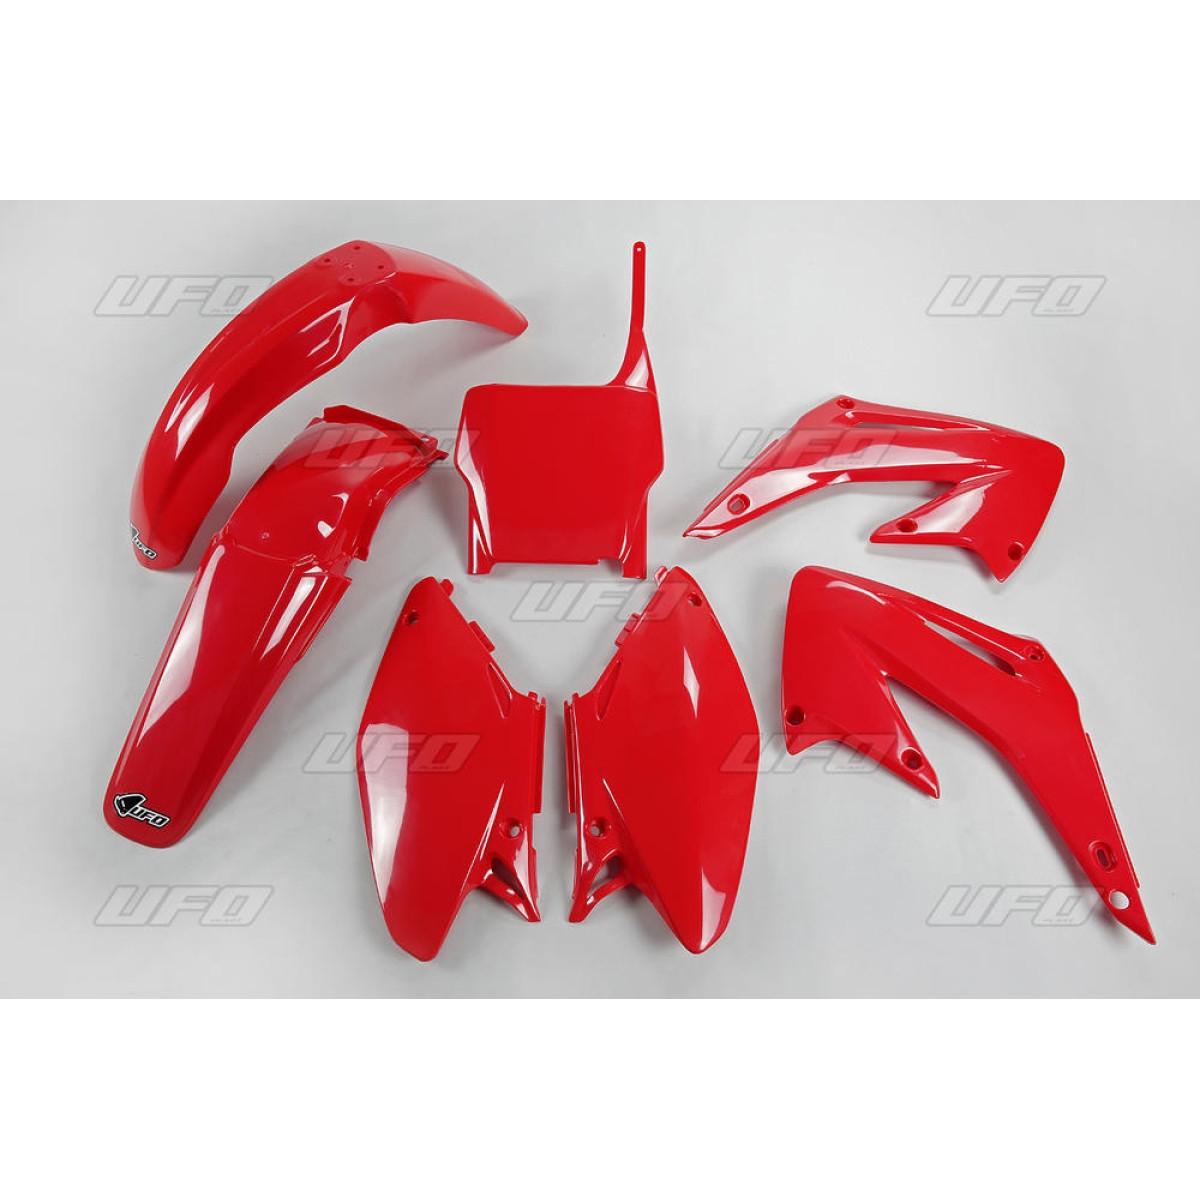 Kit plastique UFO Honda CR 125R 05-07 (rouge CR/CRF 00-18)